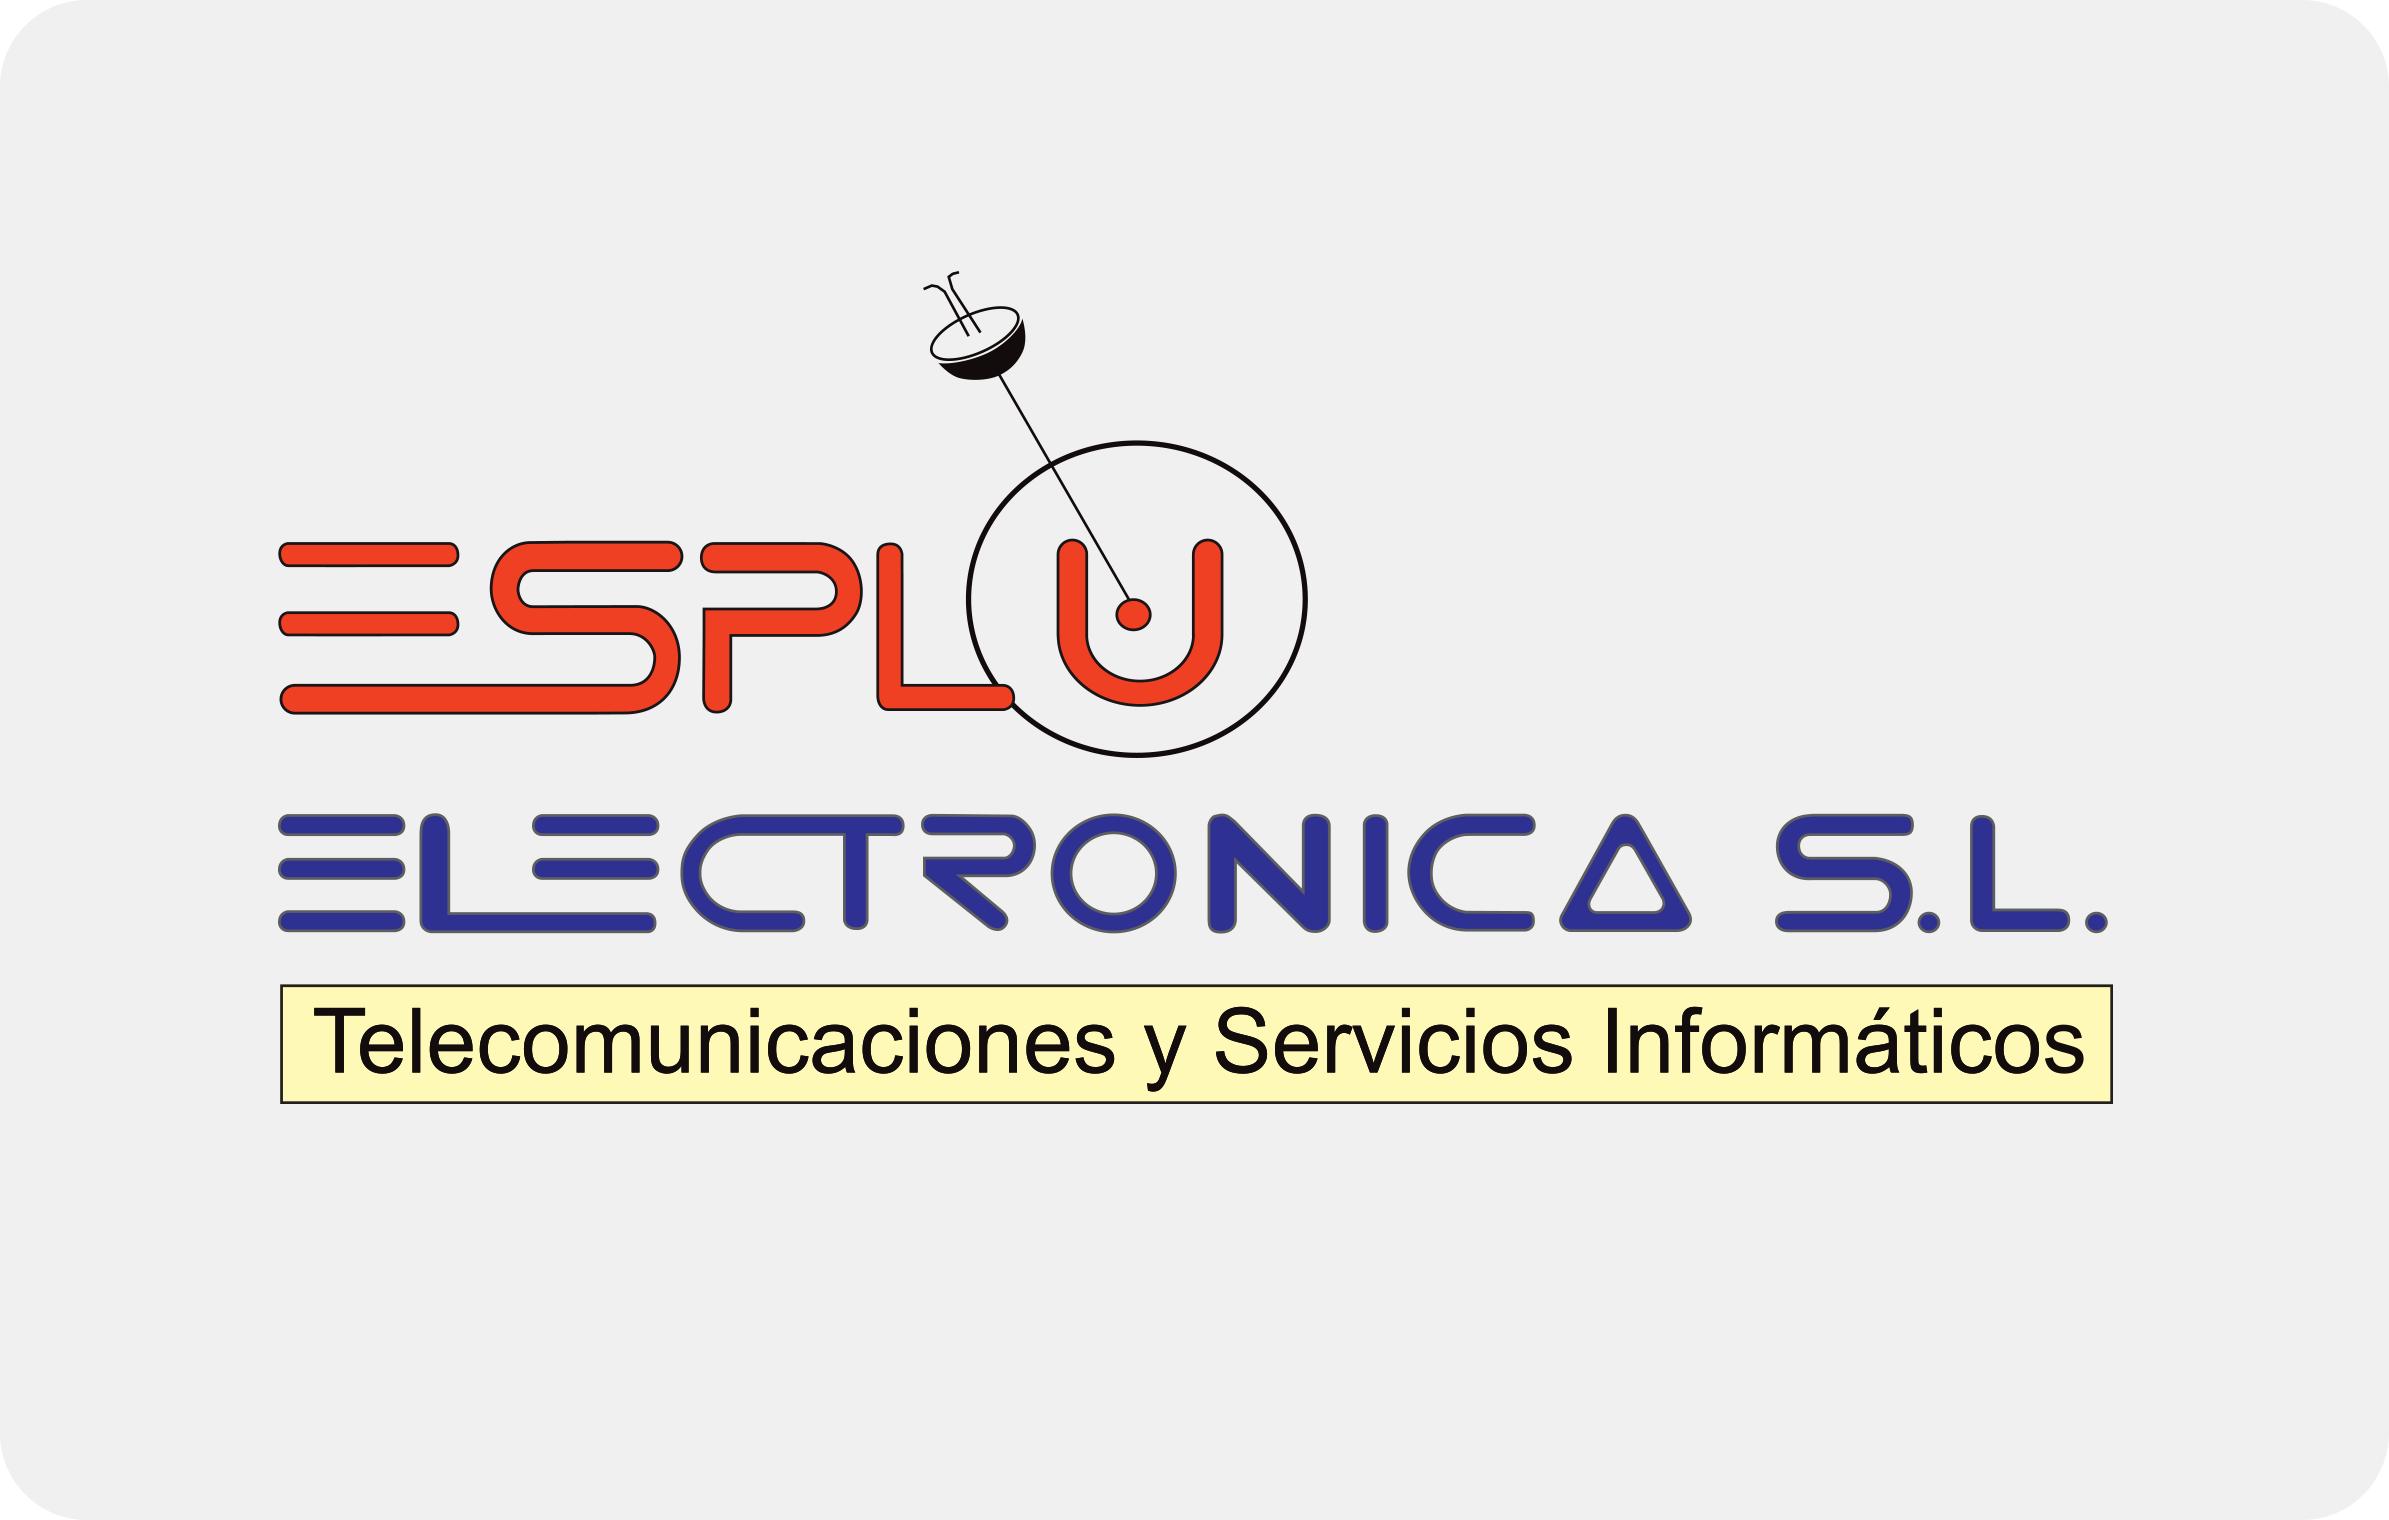 Esplu Electrónica